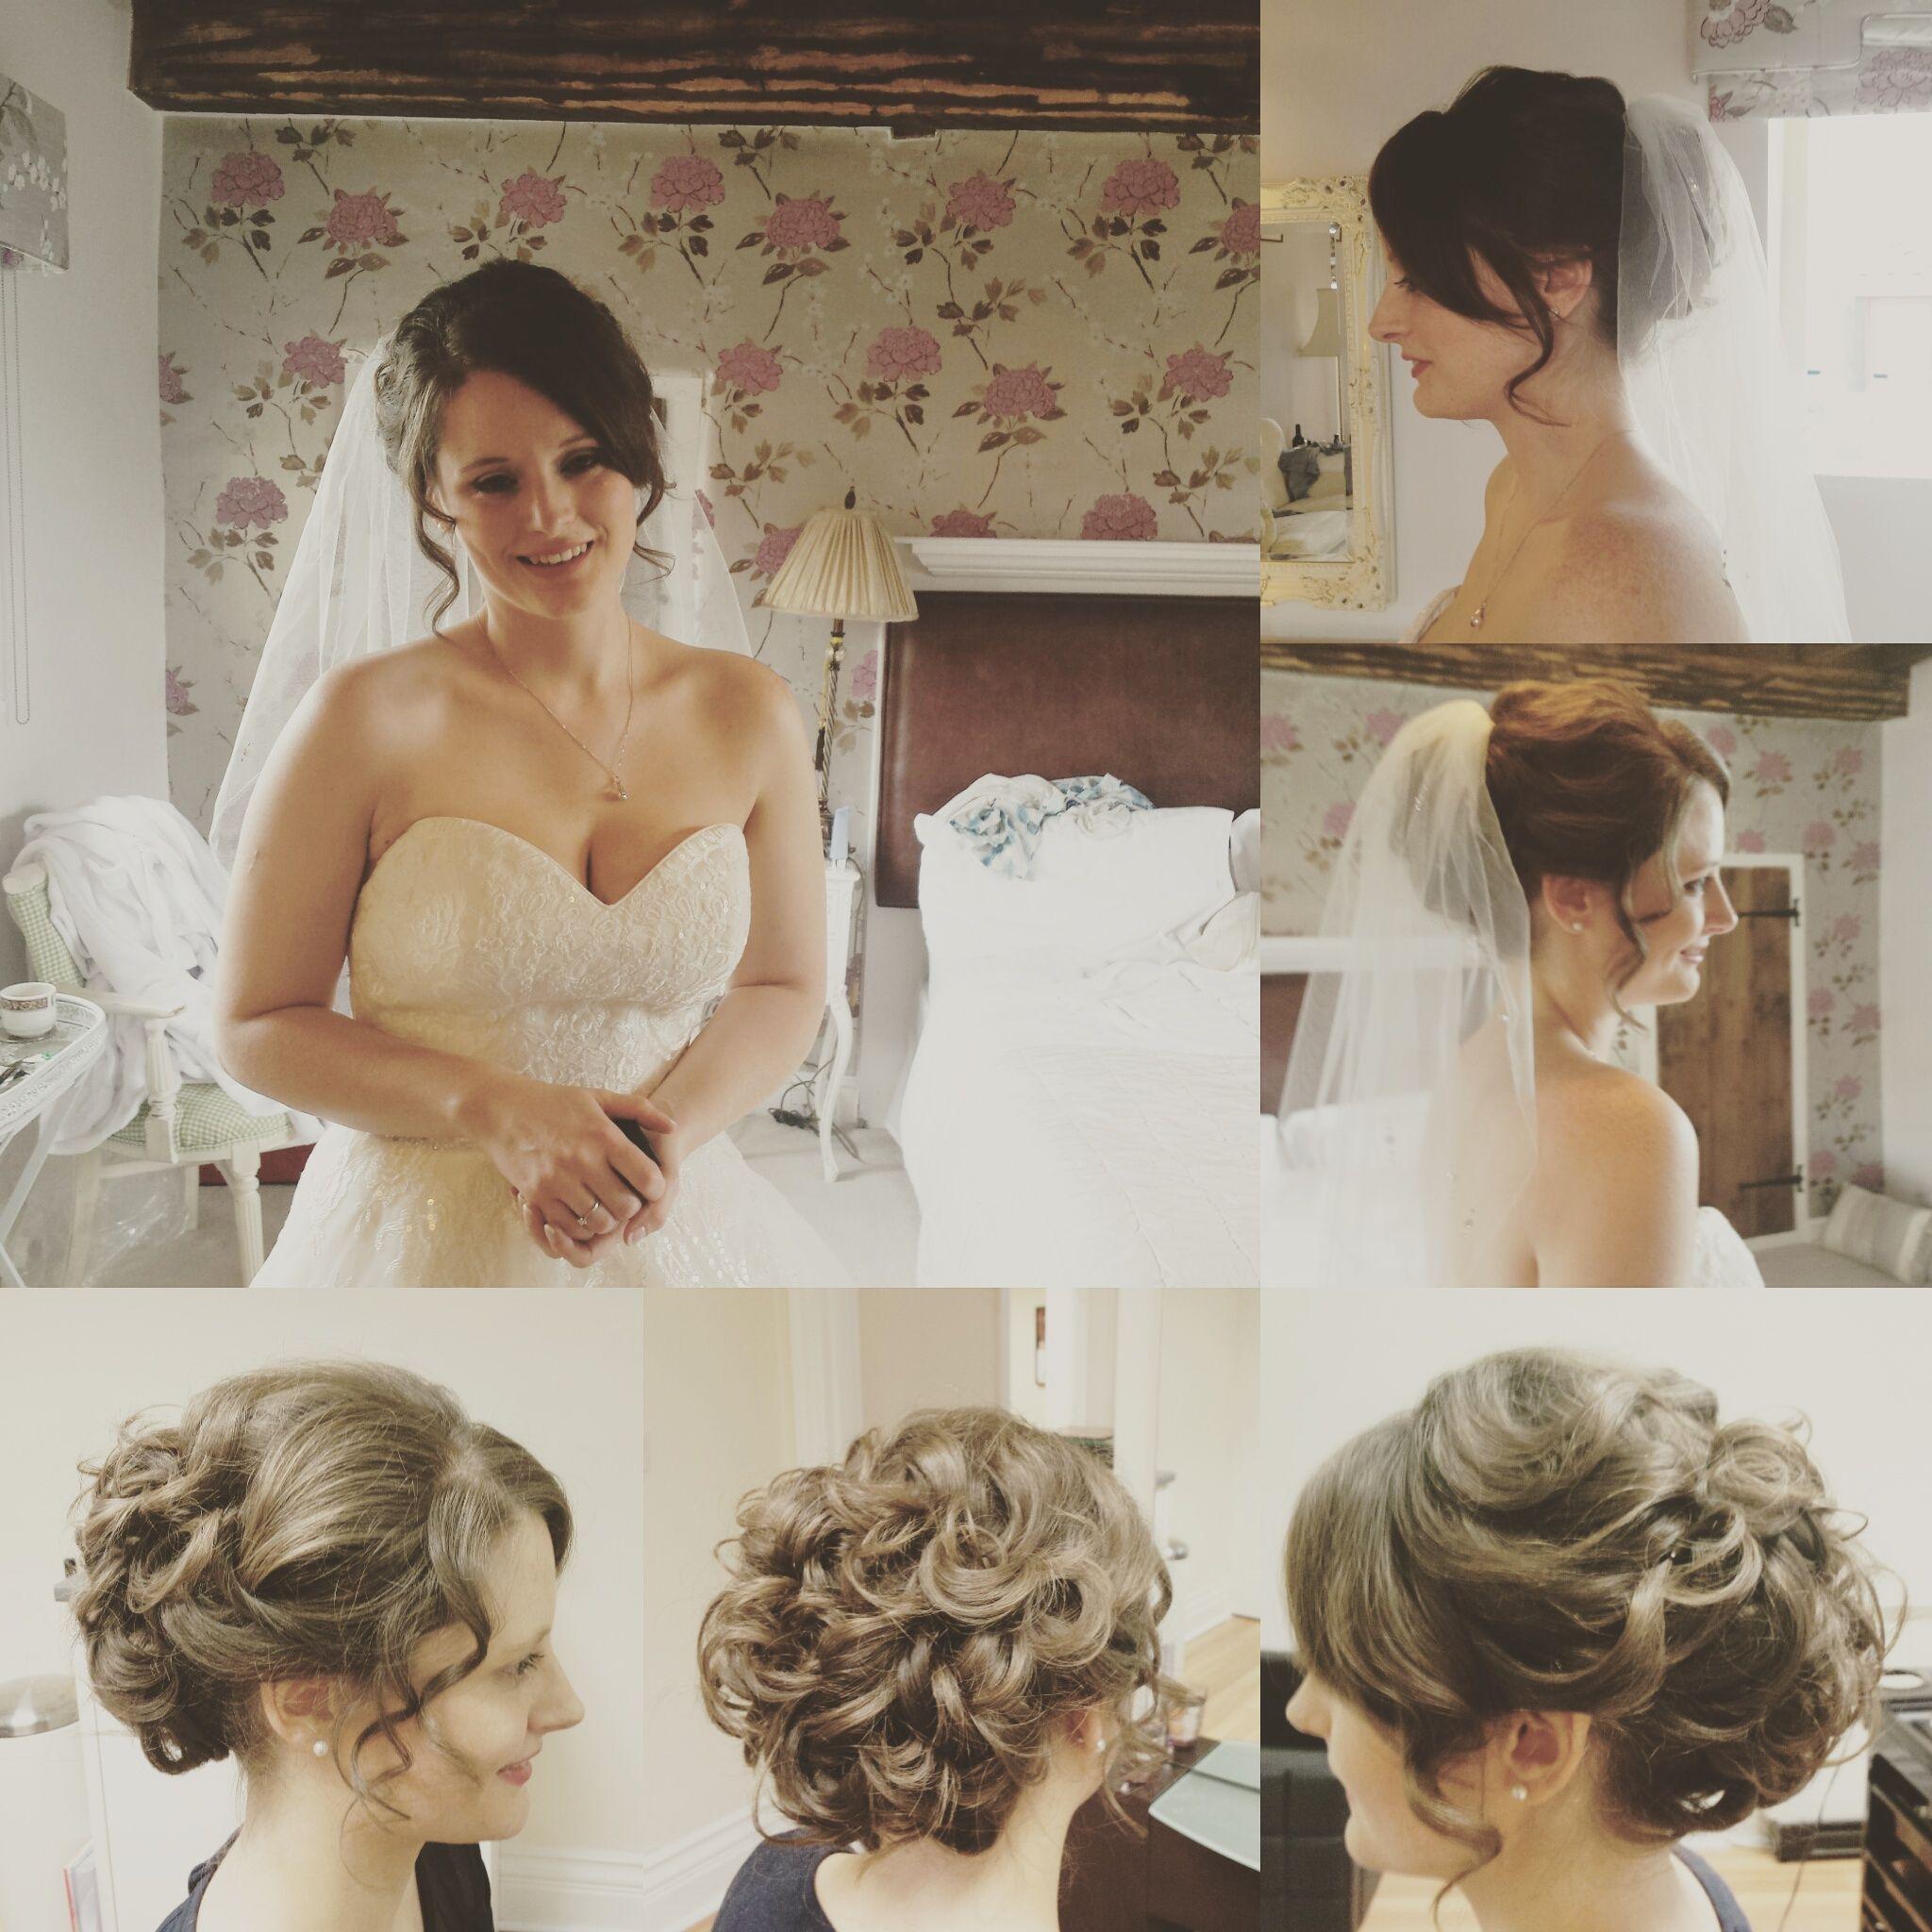 jane austin inspired wedding hair by laura hughes. norwich